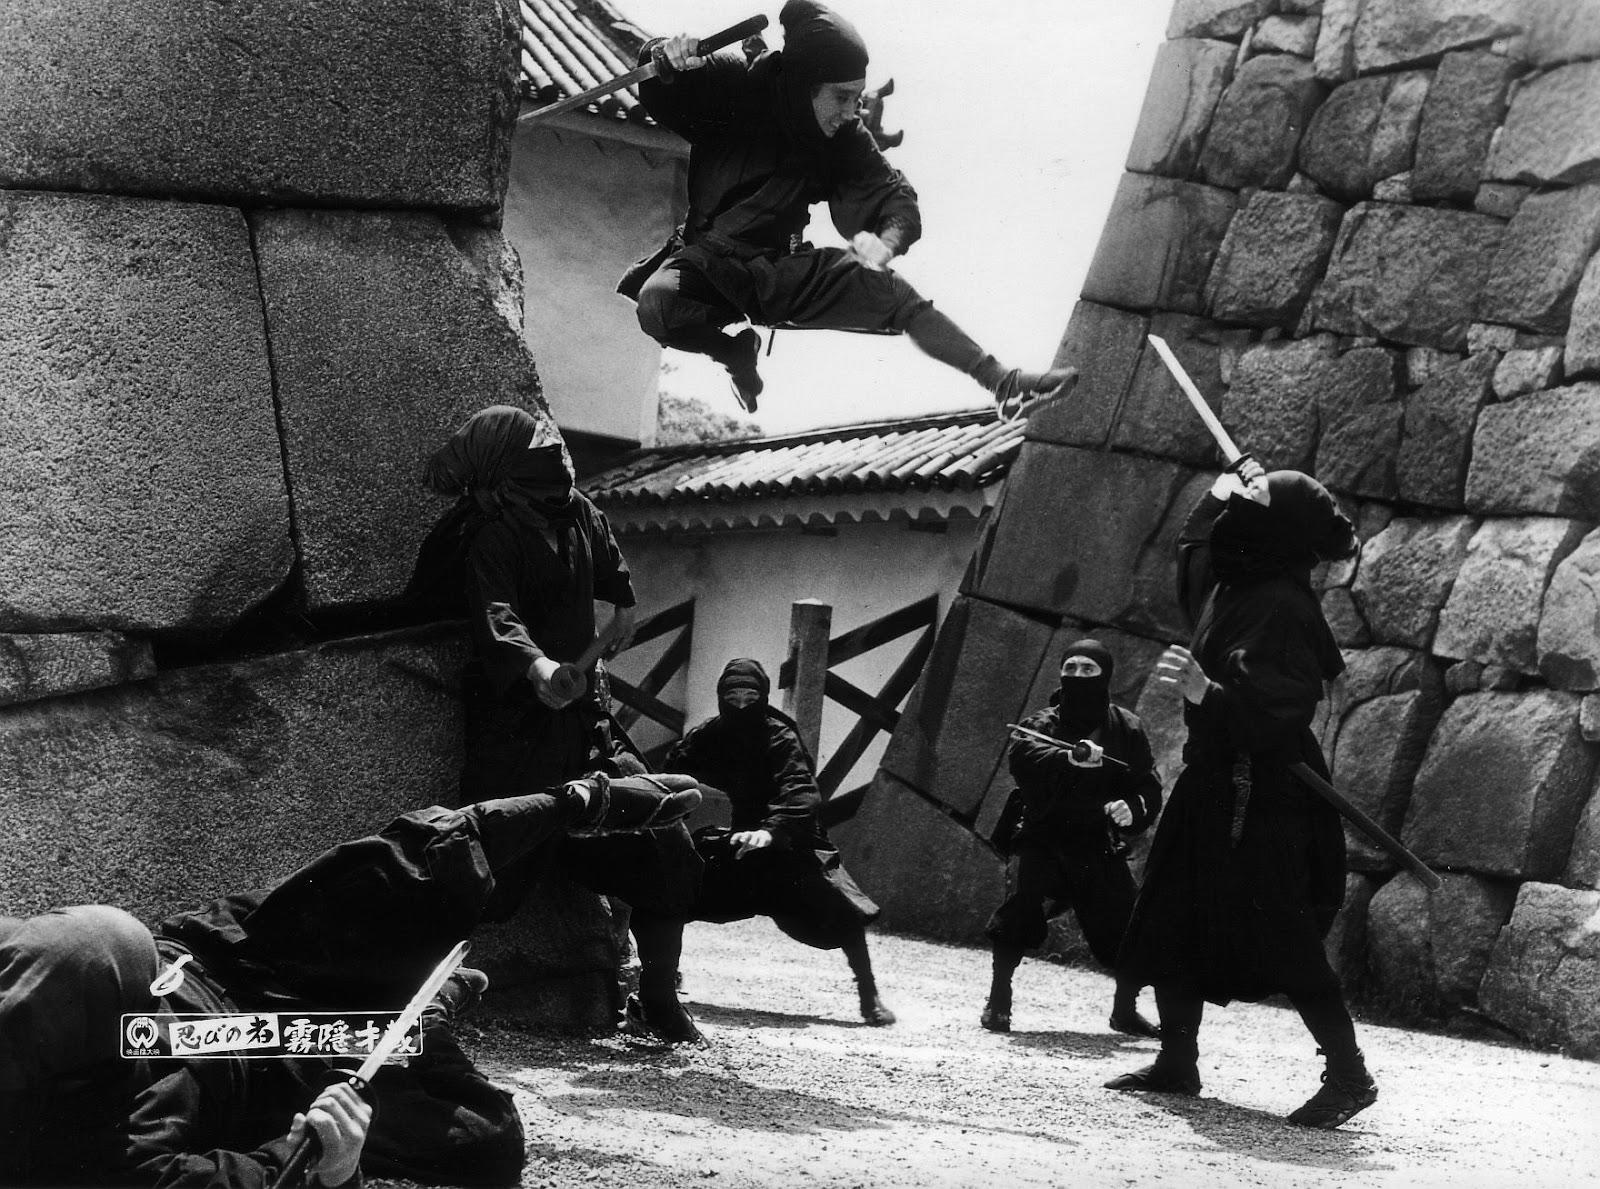 hollywoods most memorable ninja movies fandango